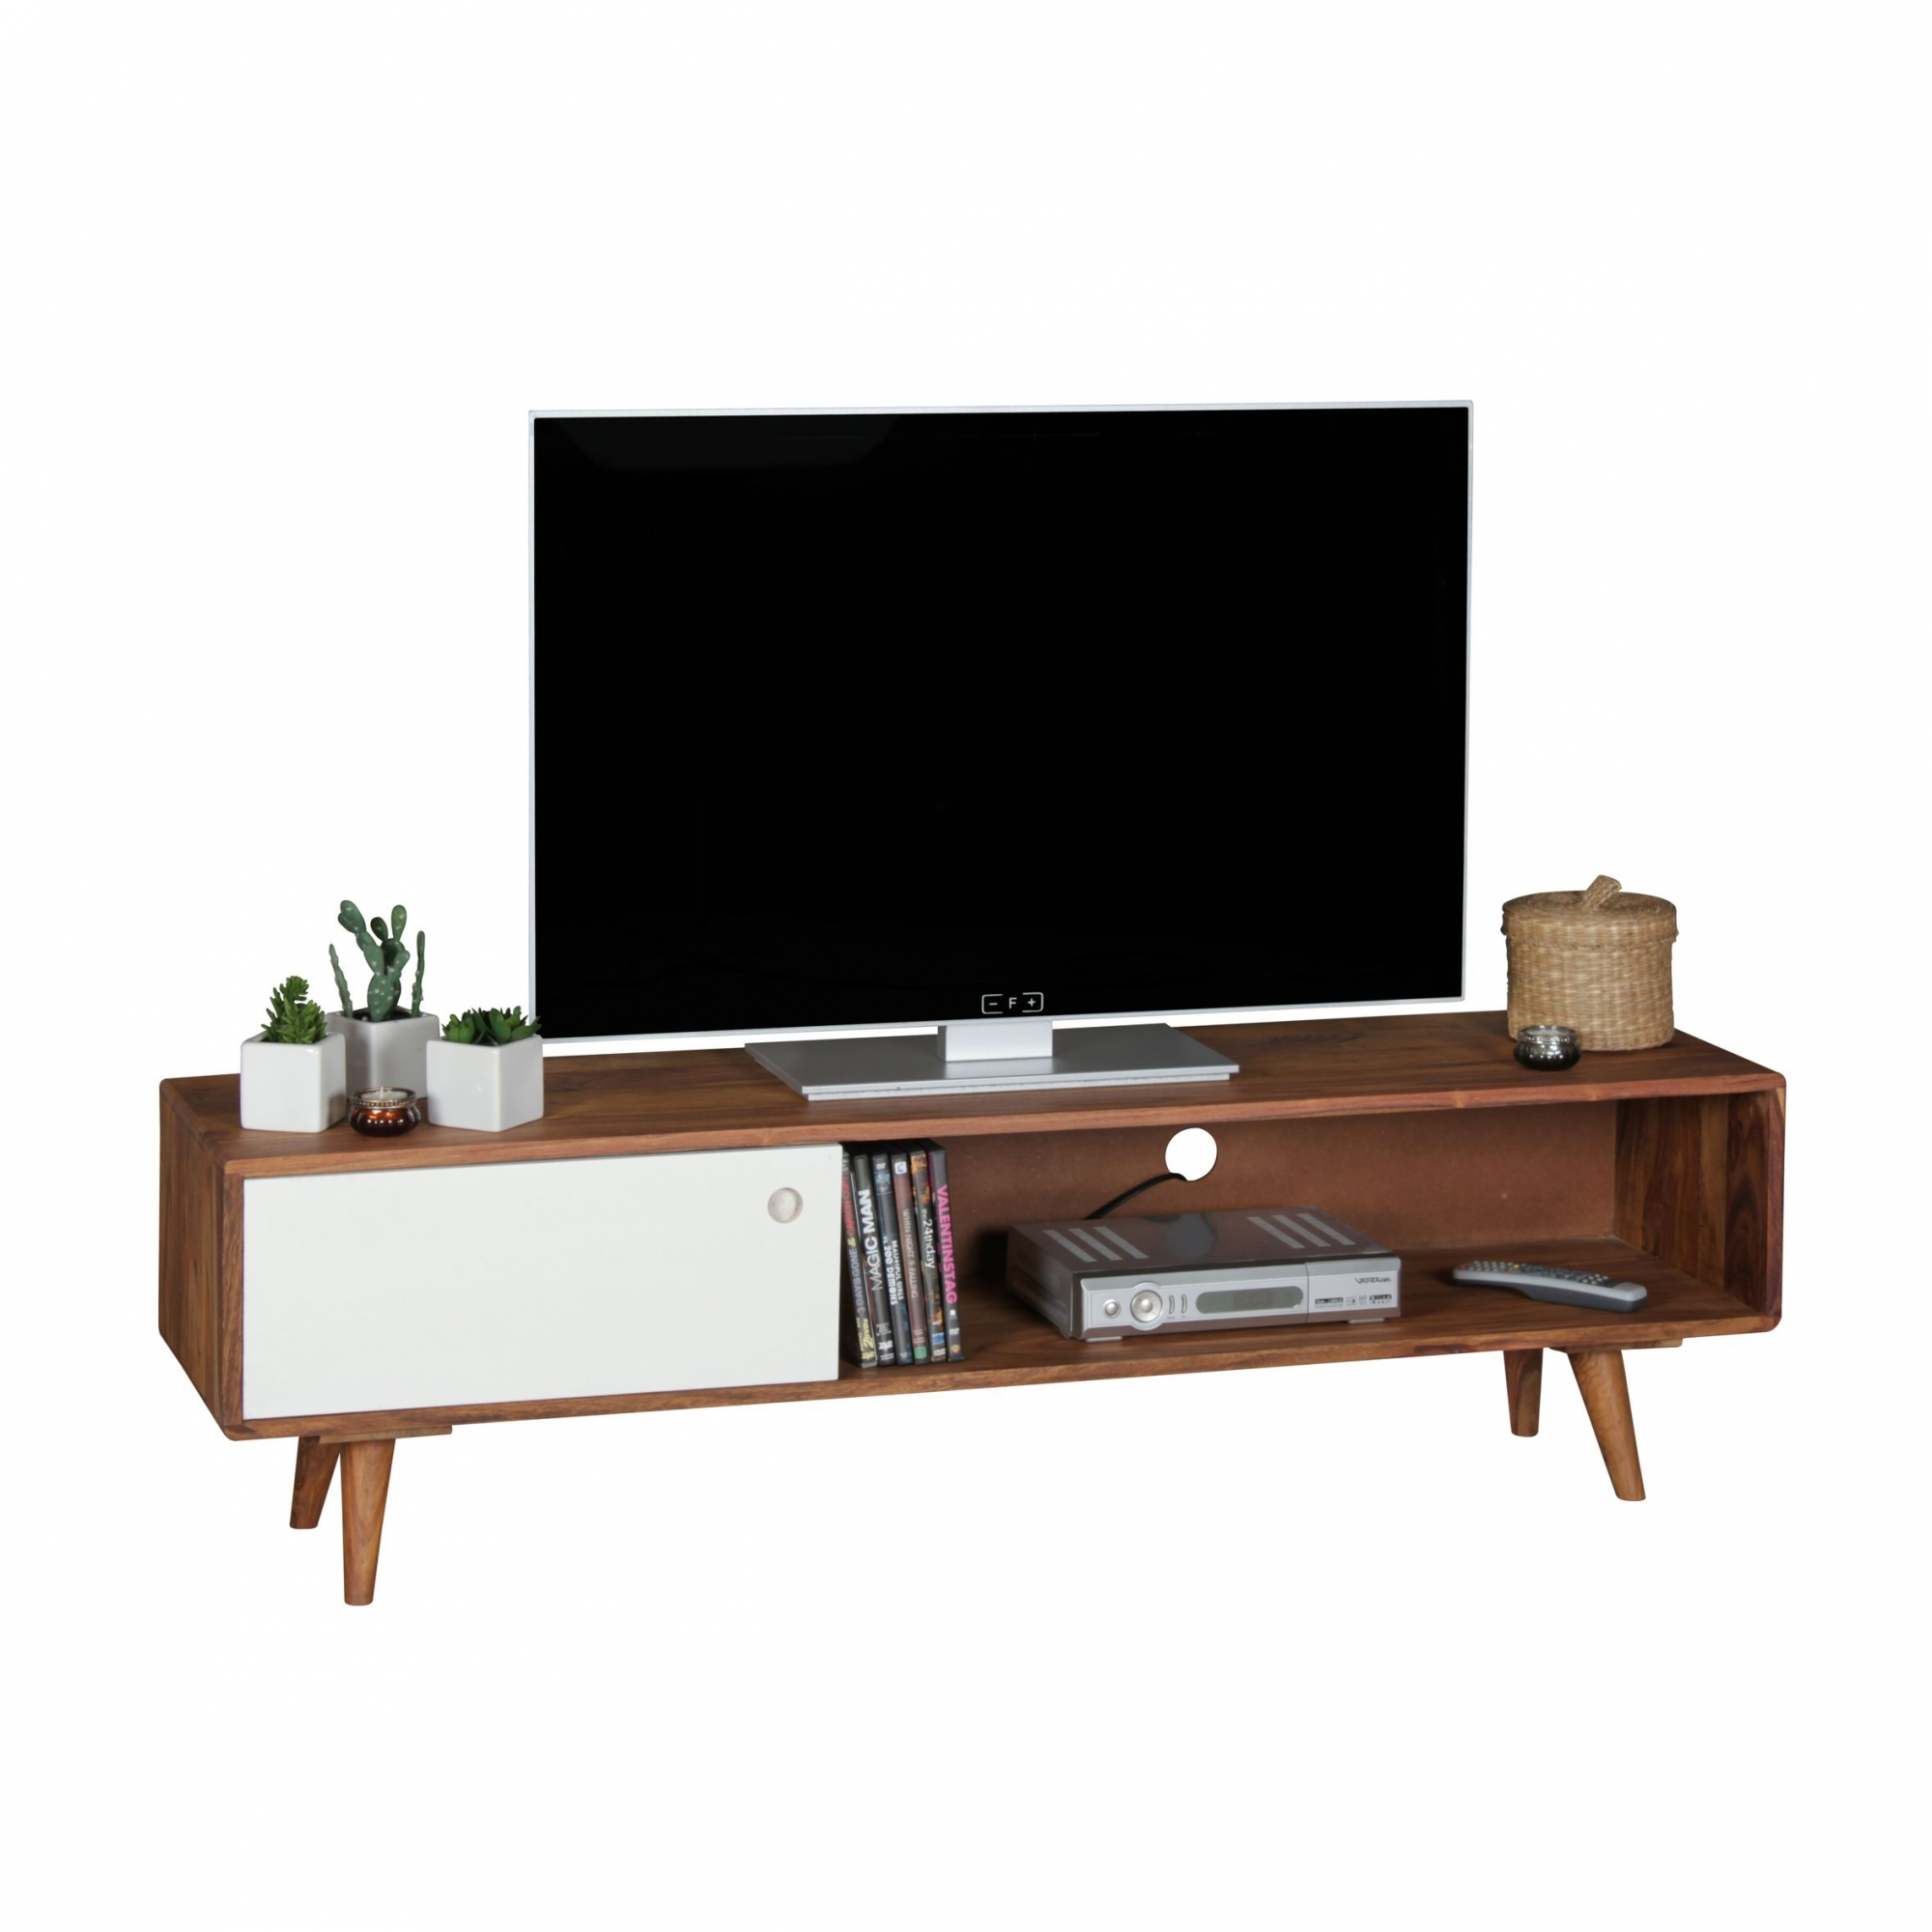 TV stolek s dvířky Repa, 140 cm, masiv Sheesham, bílá